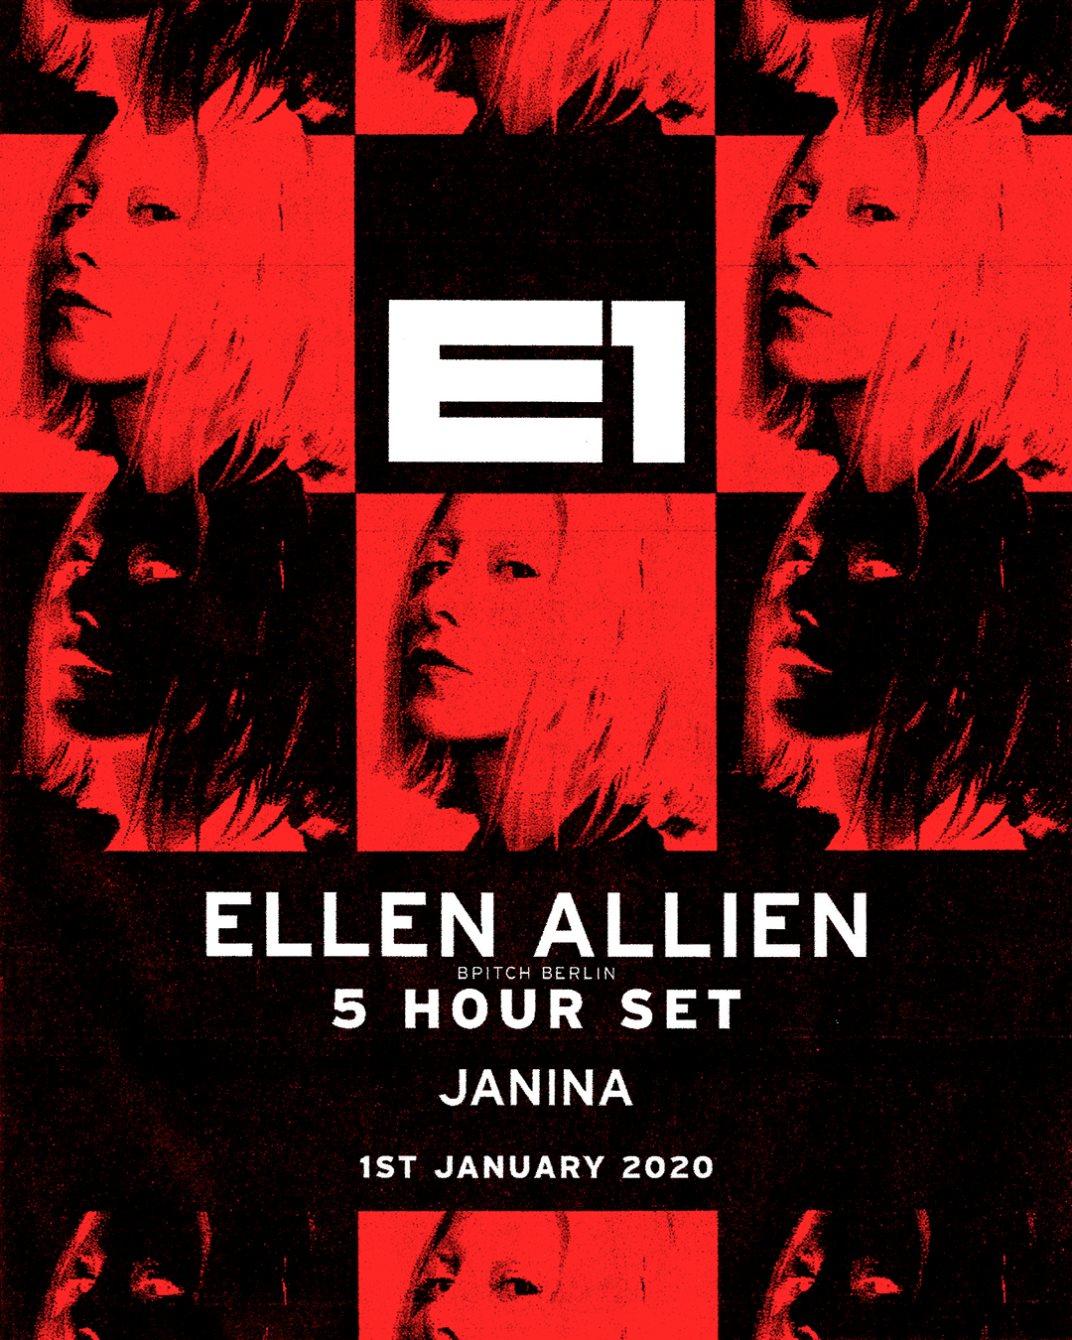 Ellen Allien (5 Hour set) with Janina - 11pm - 6am - Flyer back